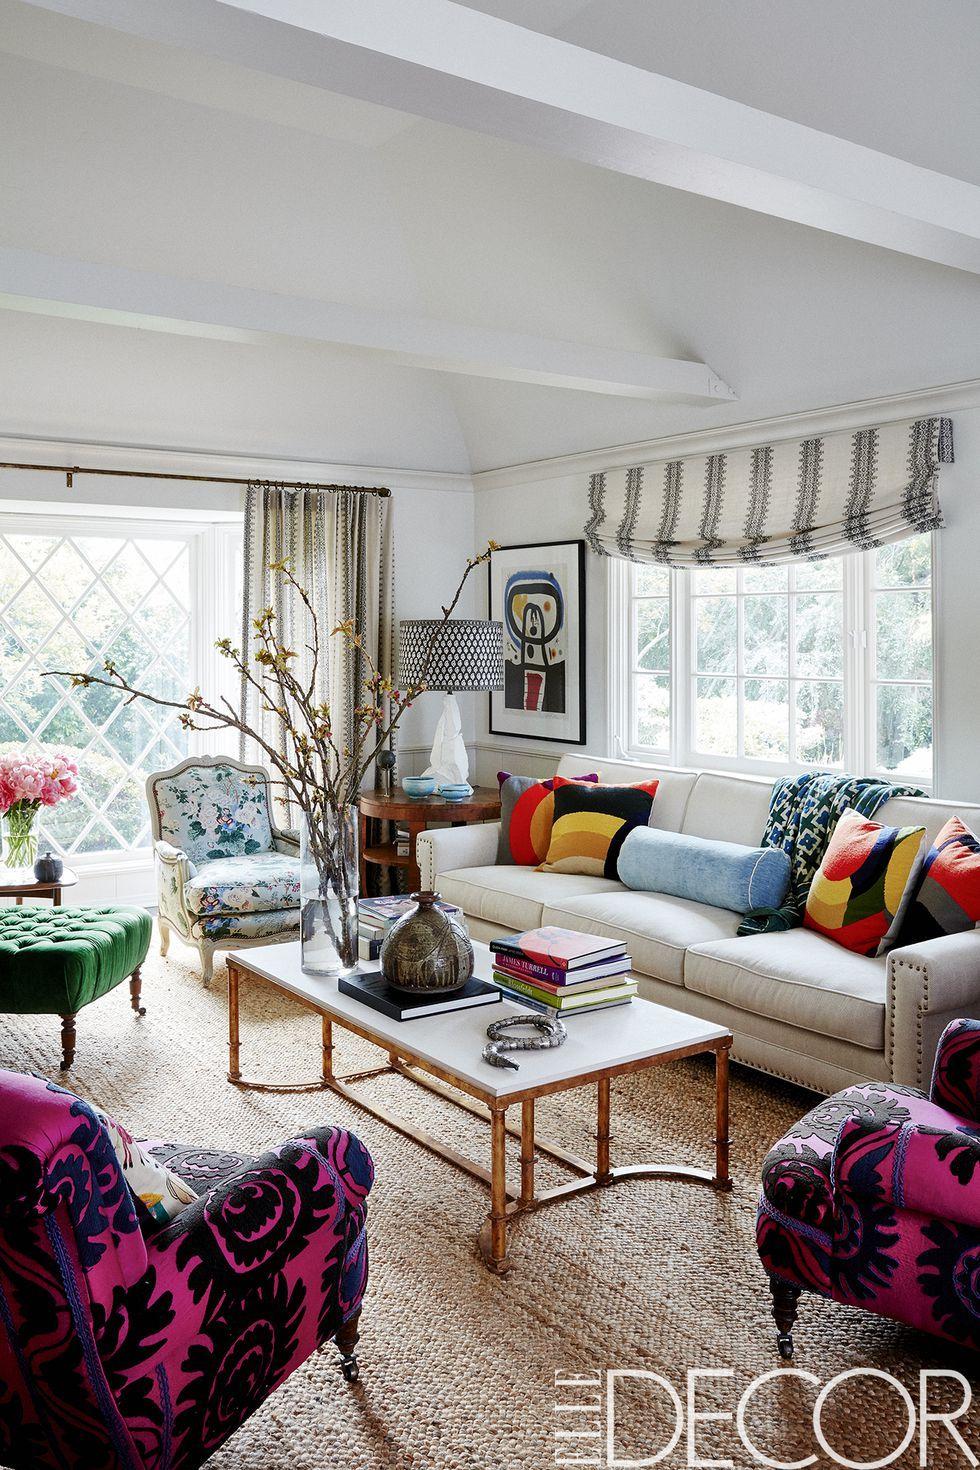 55 Inspiring Living Room Curtain Ideas - Elegant Window Drapes on Living Room Curtains Ideas  id=92521